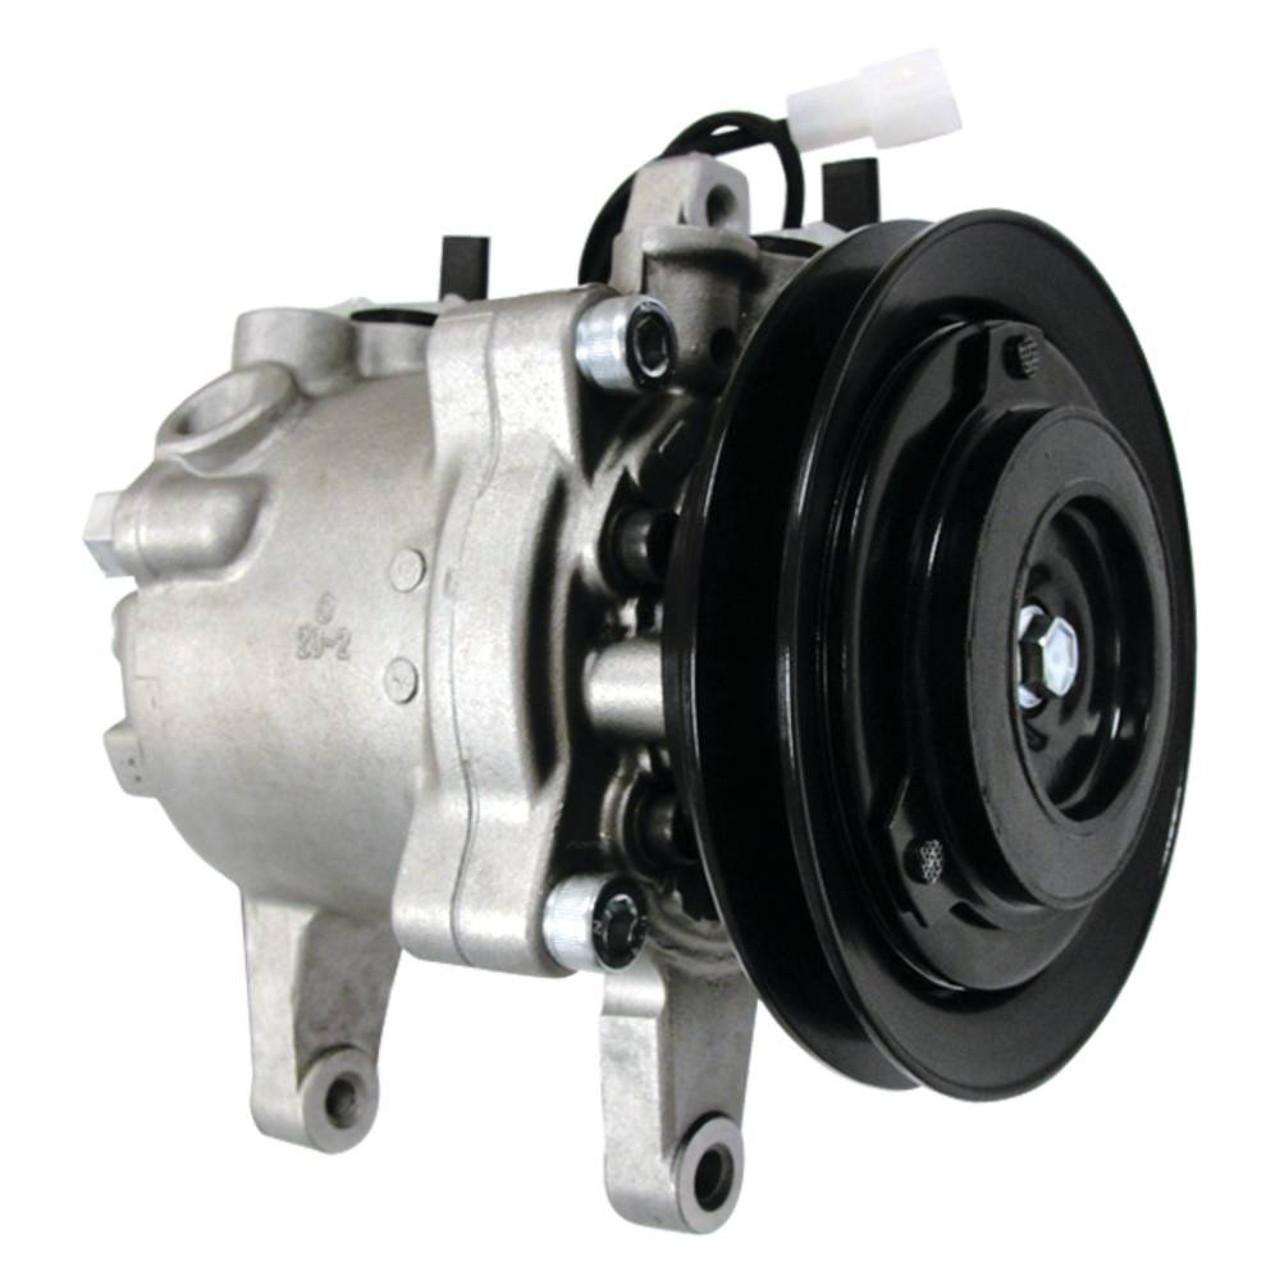 New Ac Compressor For Kubota M5040, M5040C, M5040Dtc, M5040Hdc